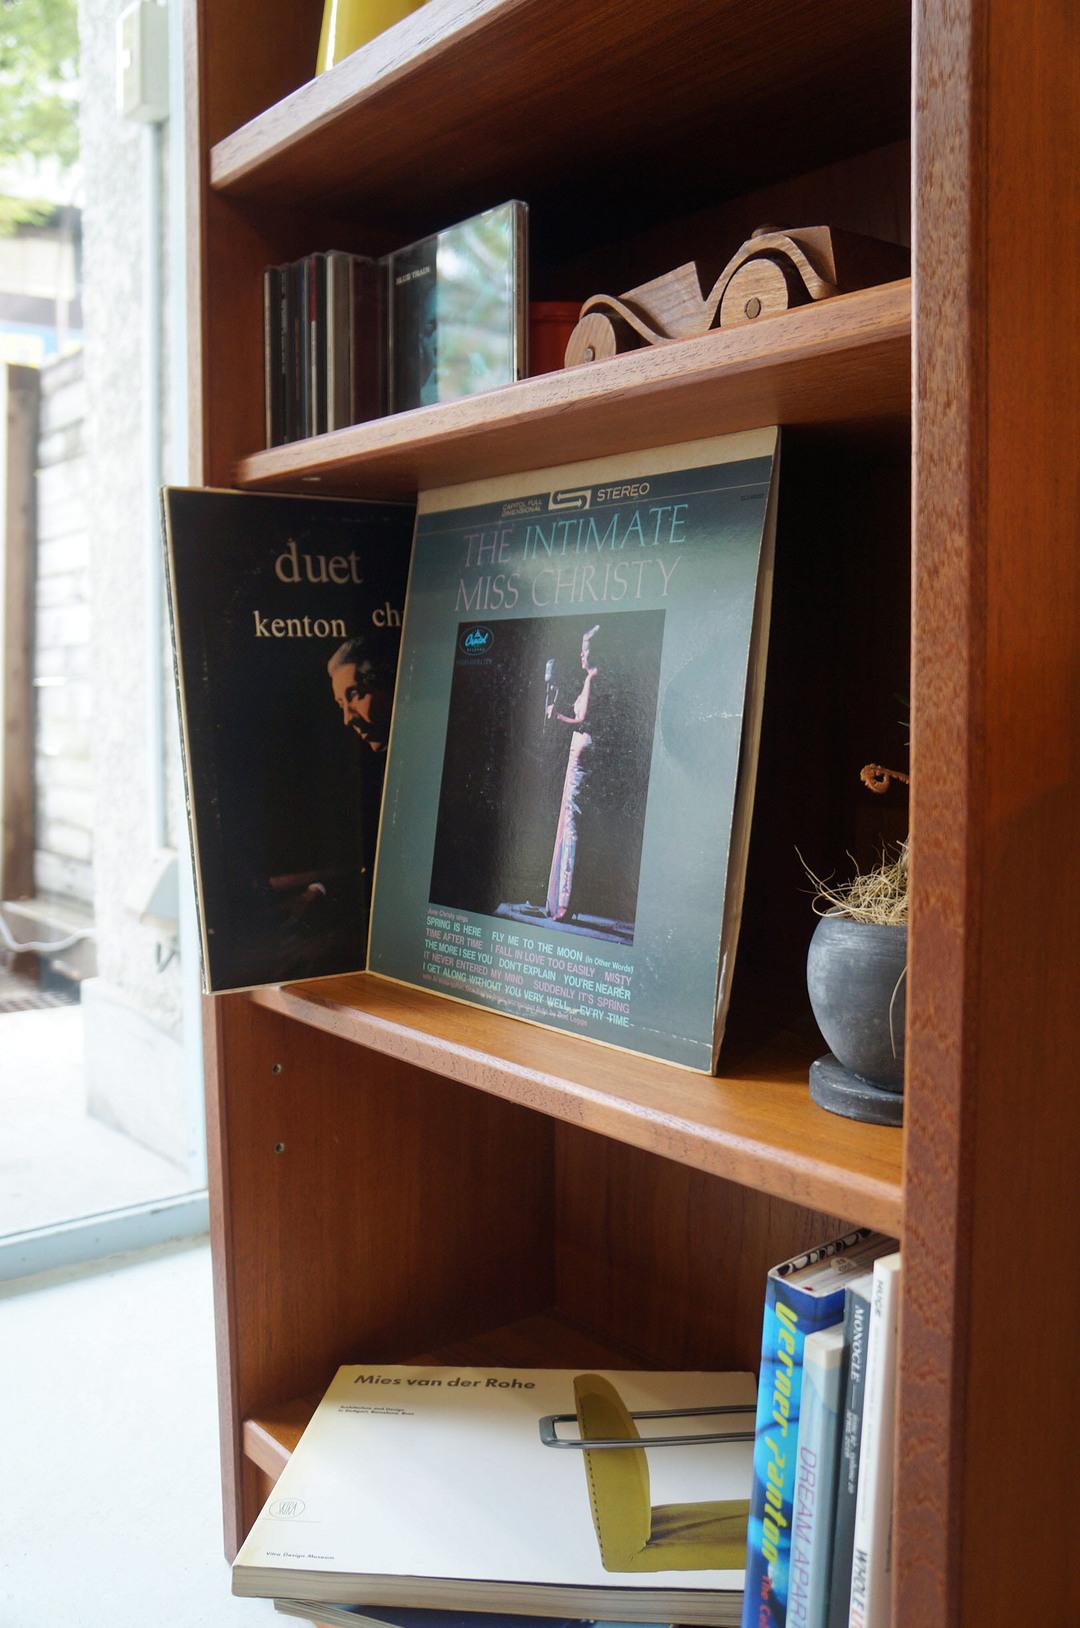 Japanese Vintage Teakwood Book Case/ジャパンヴィンテージ 本棚 チーク材 ブックシェルフ 収納 シンプルモダン スリム